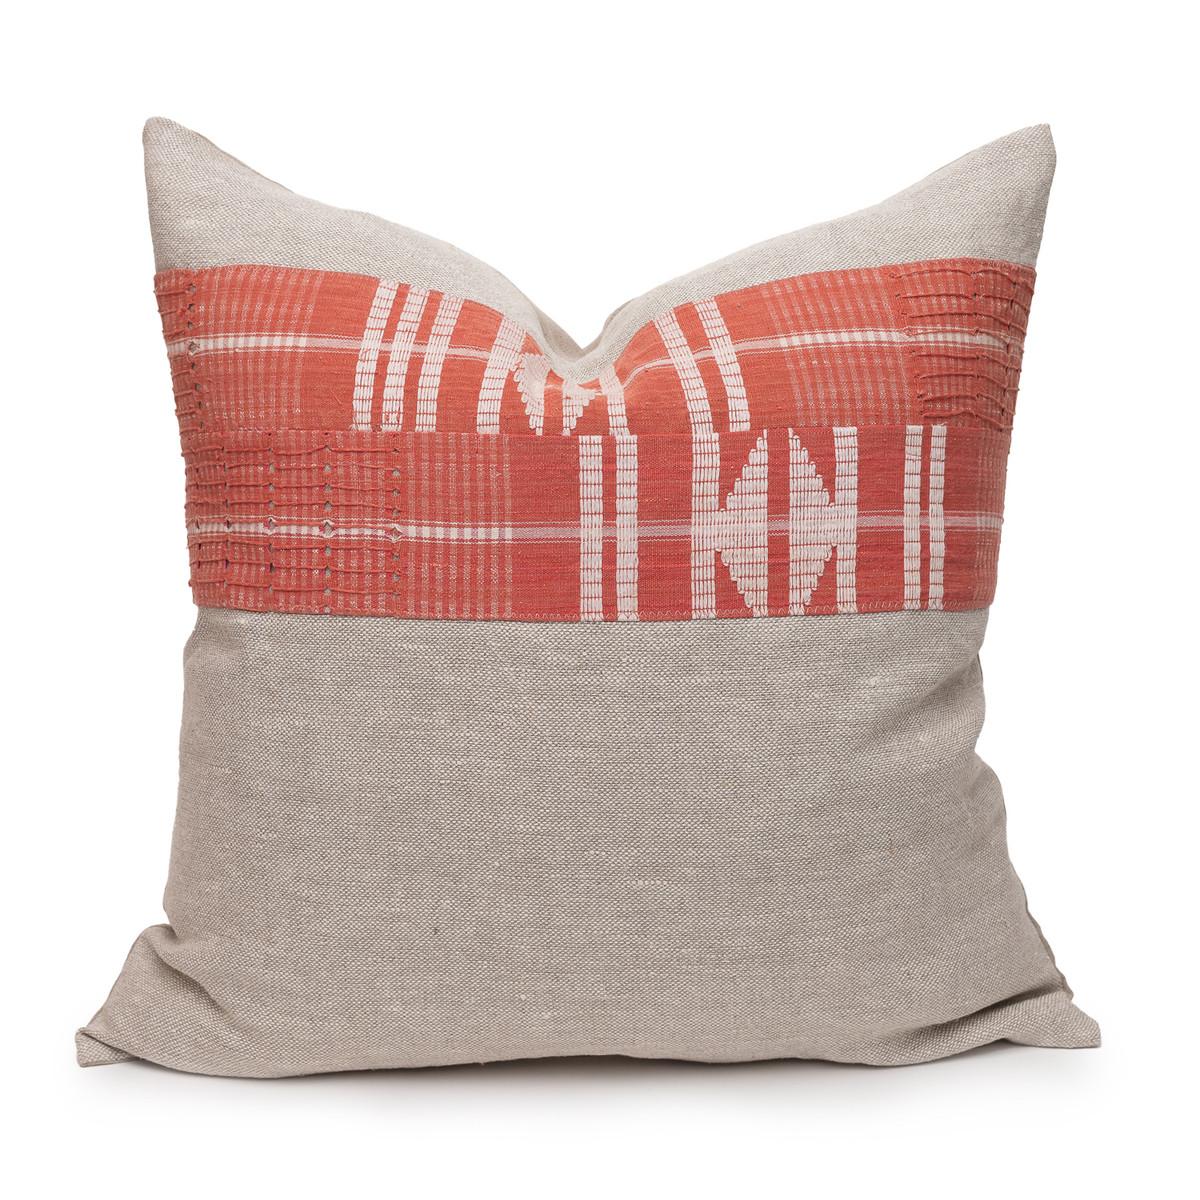 Coral Seas Aso Oke Luxe Vintage Pillow - 22 - Front